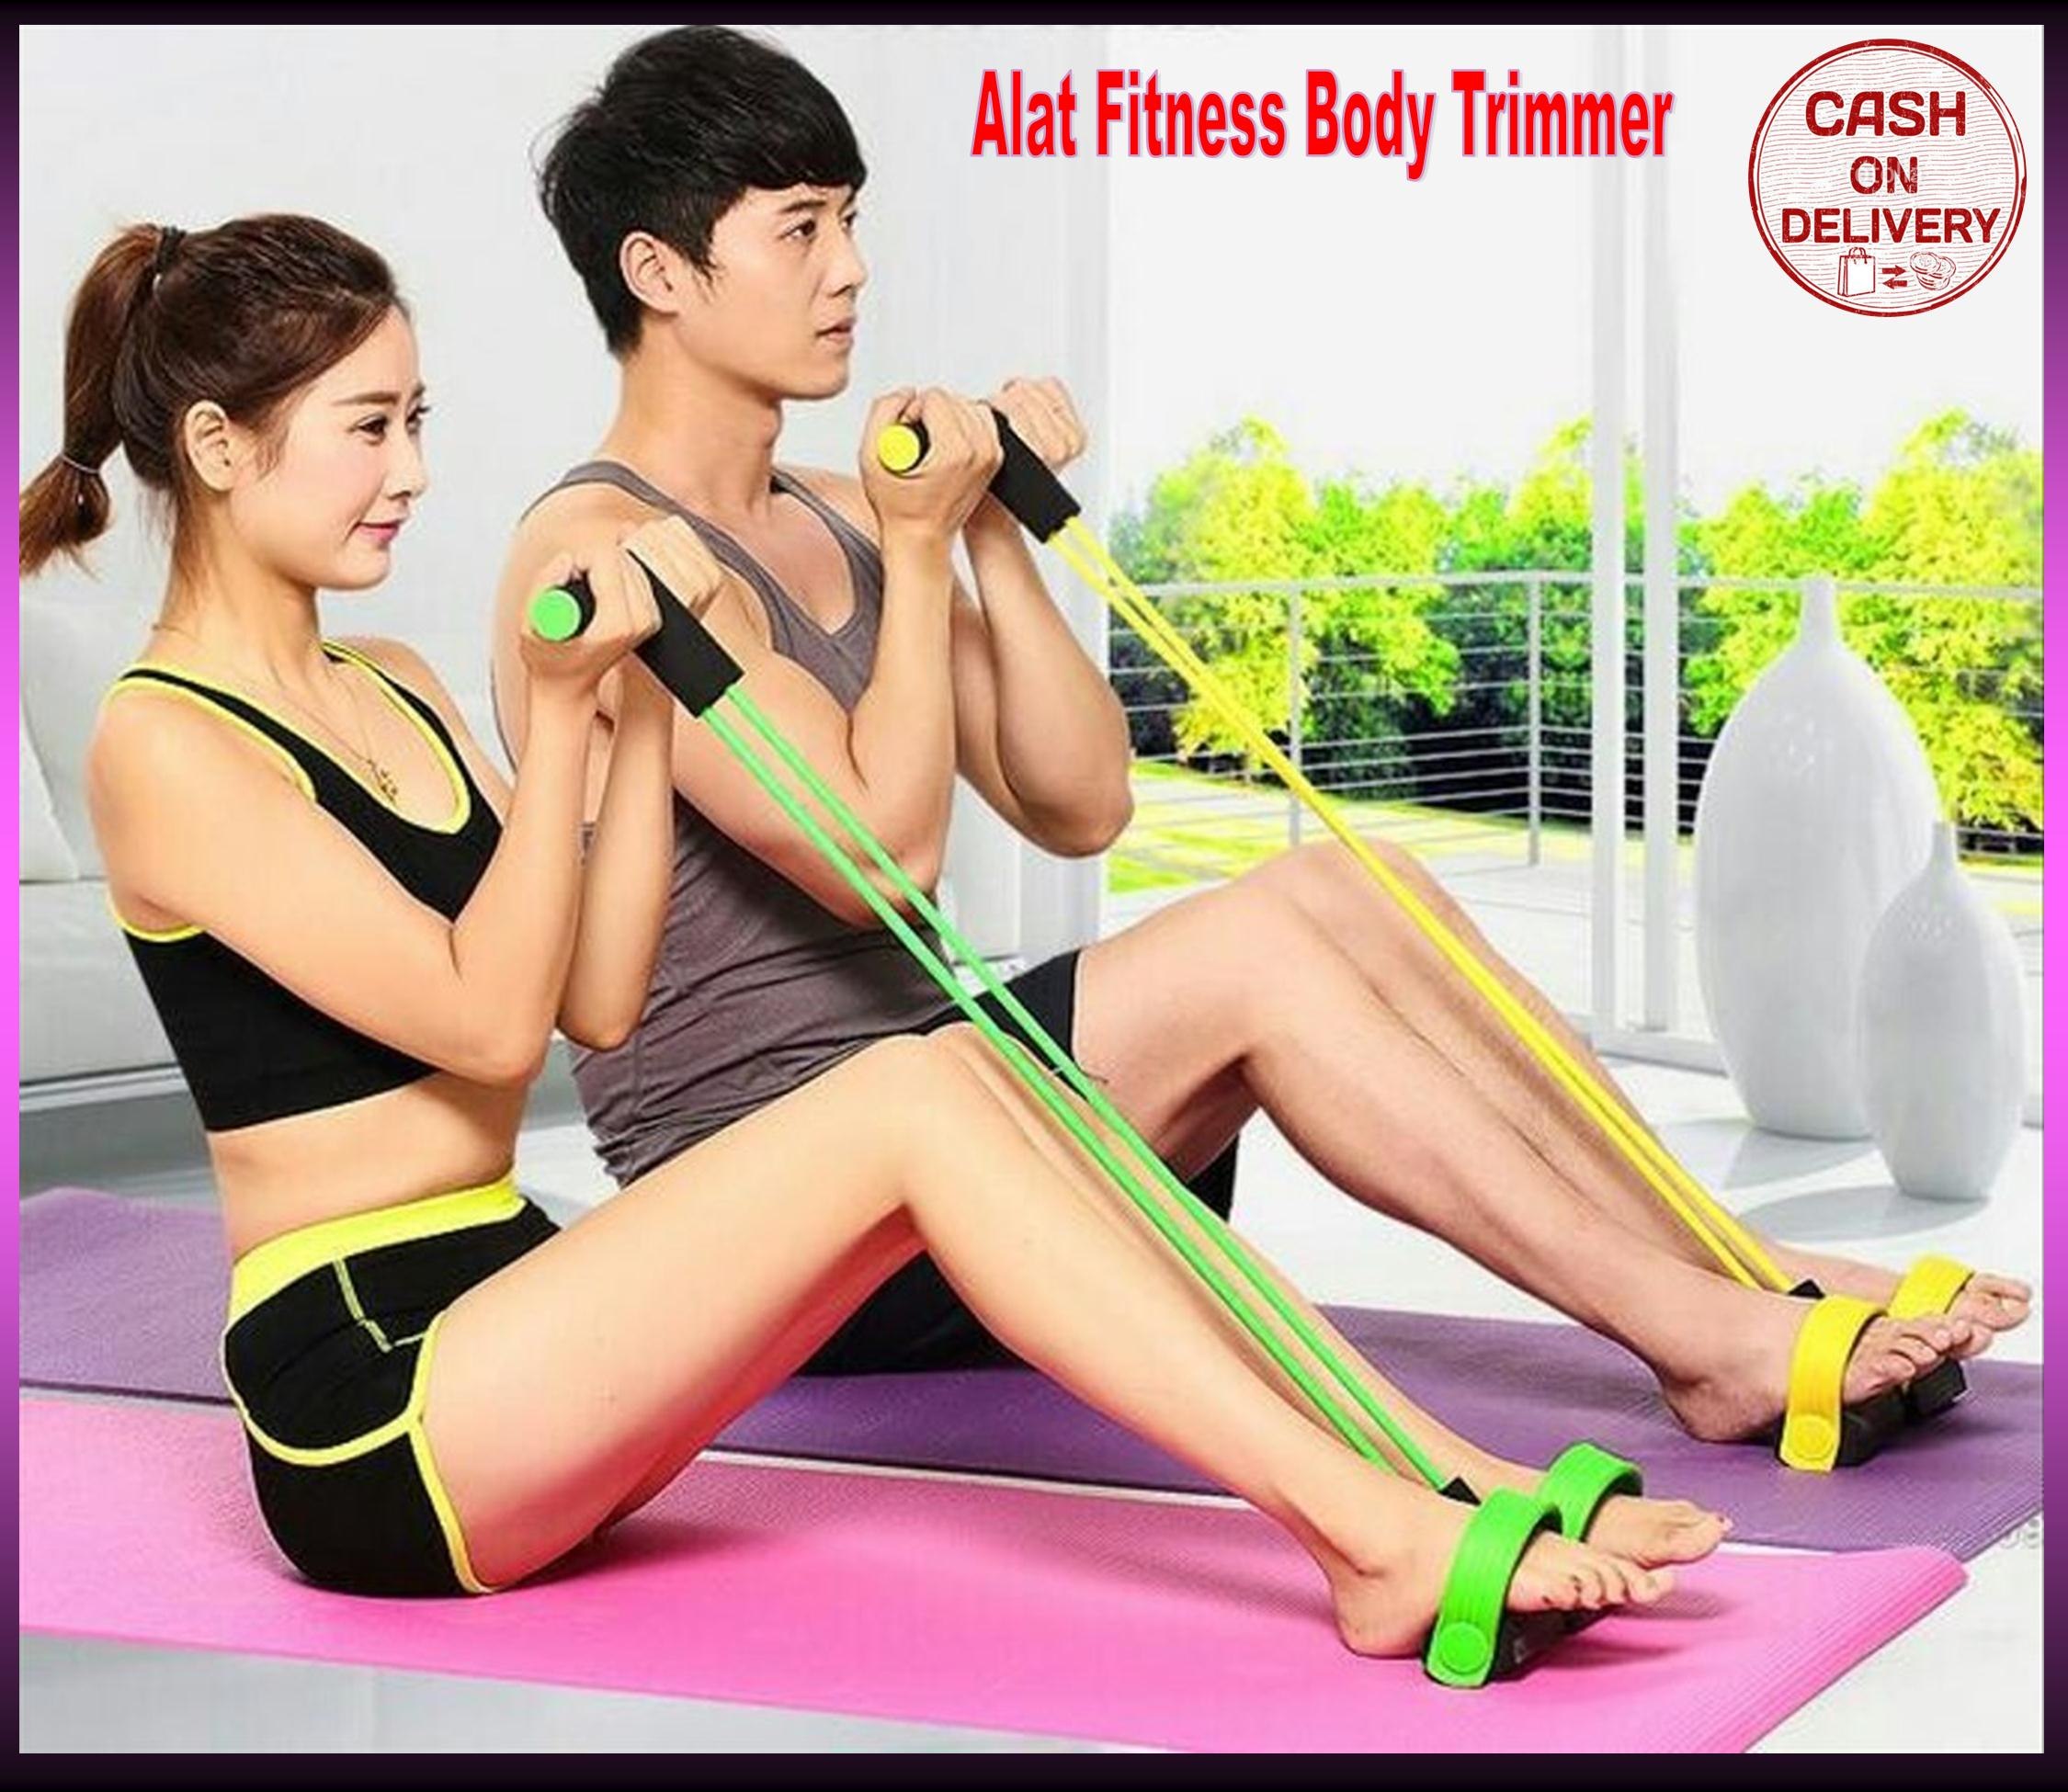 sien collection alat fitness body trimmer / alat olahraga / alat fitness / alat pengecil perut